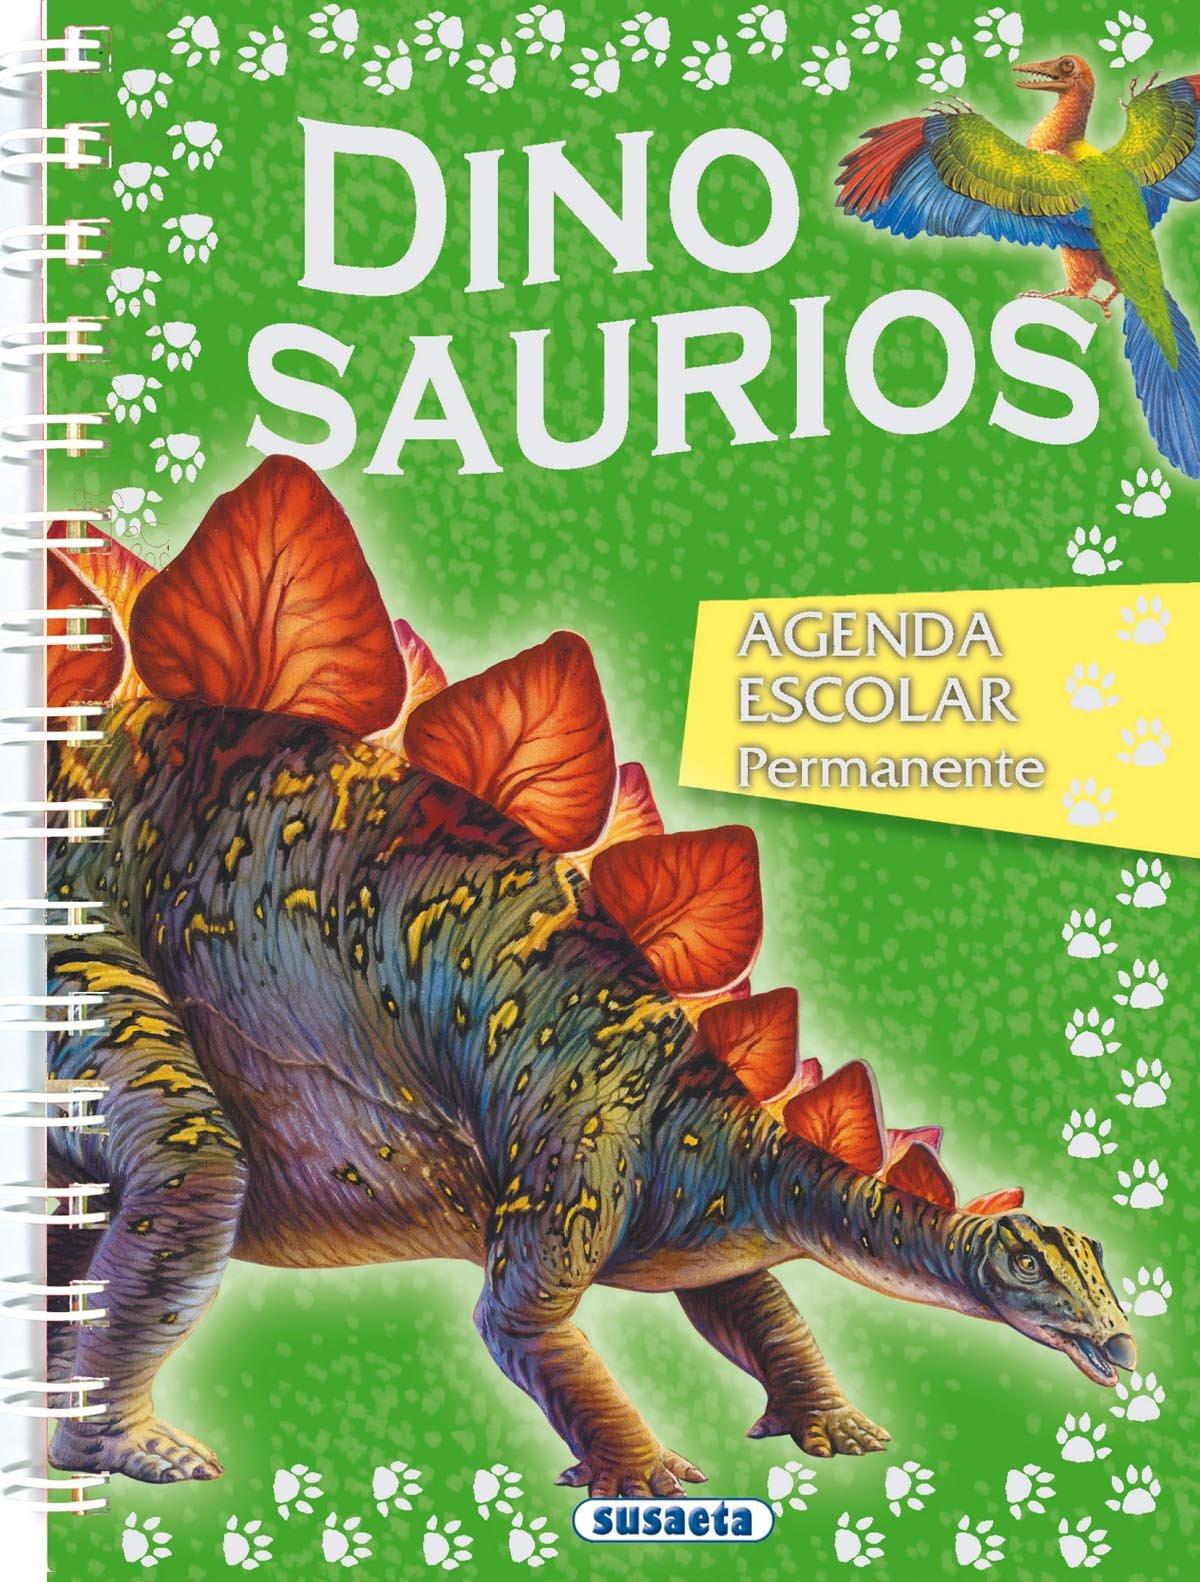 Agenda escolar permanente dinosaurios Agenda Dinosaurios ...